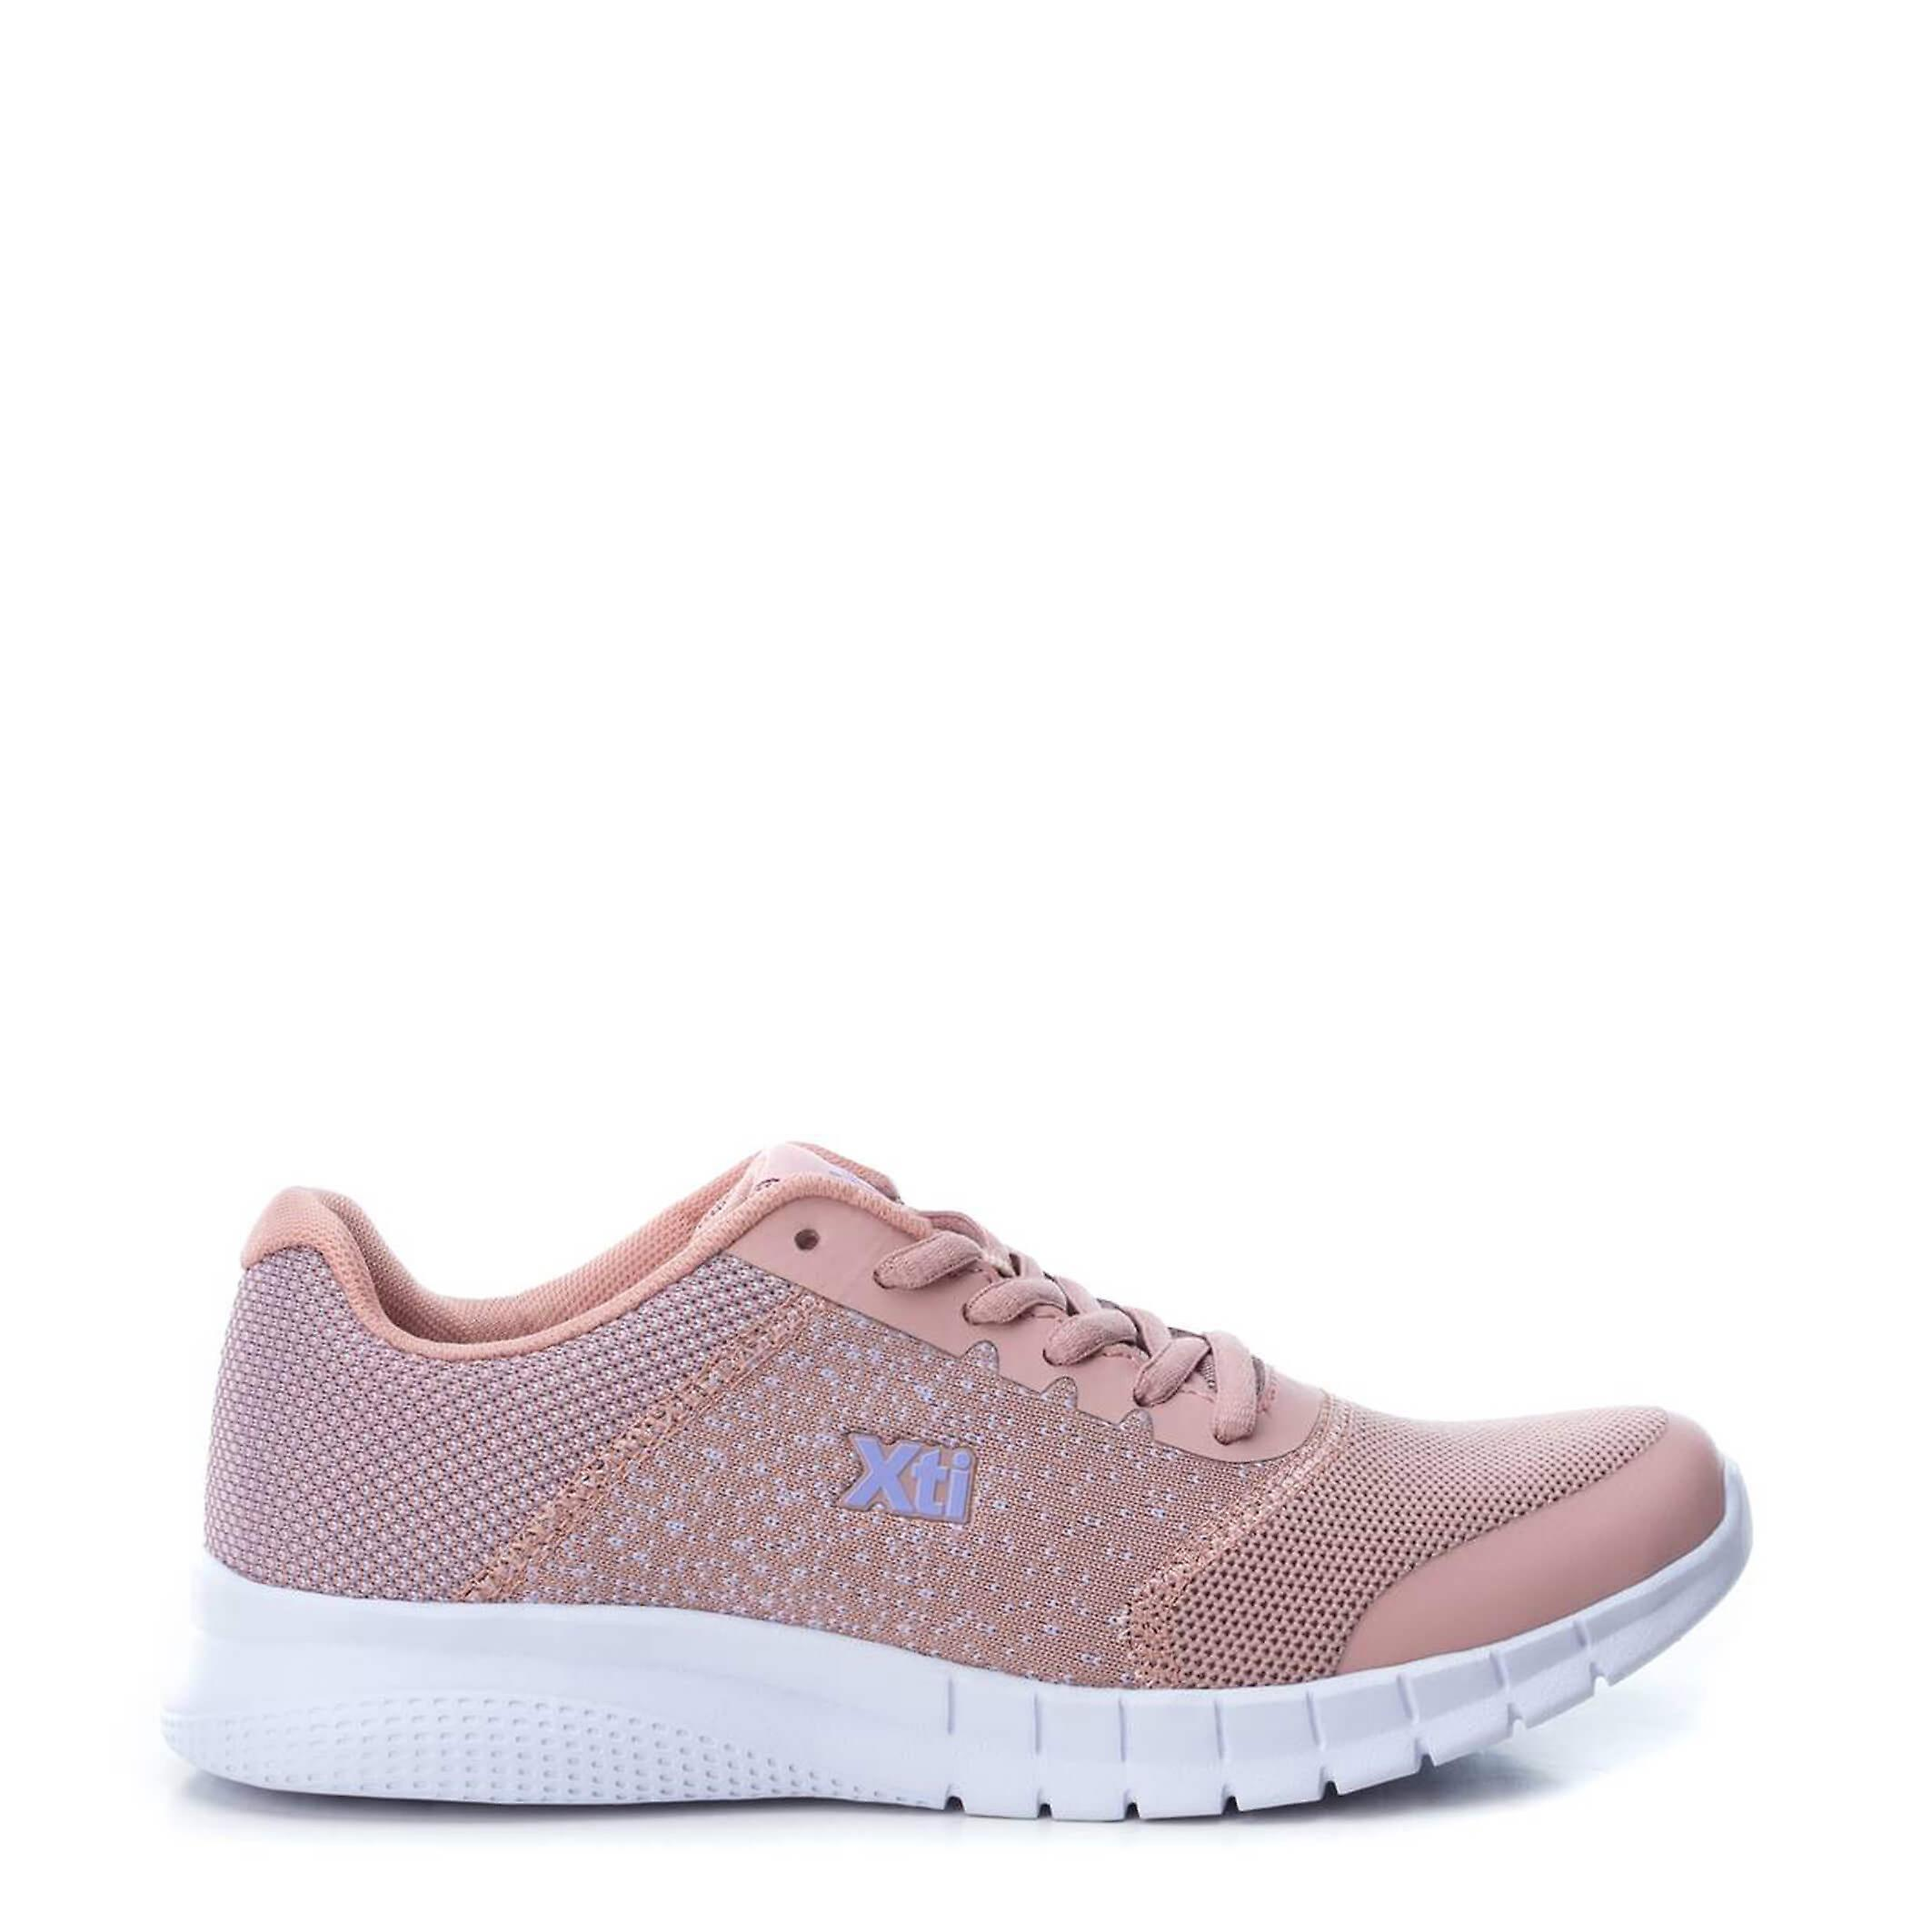 Xti Original Women Spring/Summer Sneakers - Pink Color 41929 oNsLO